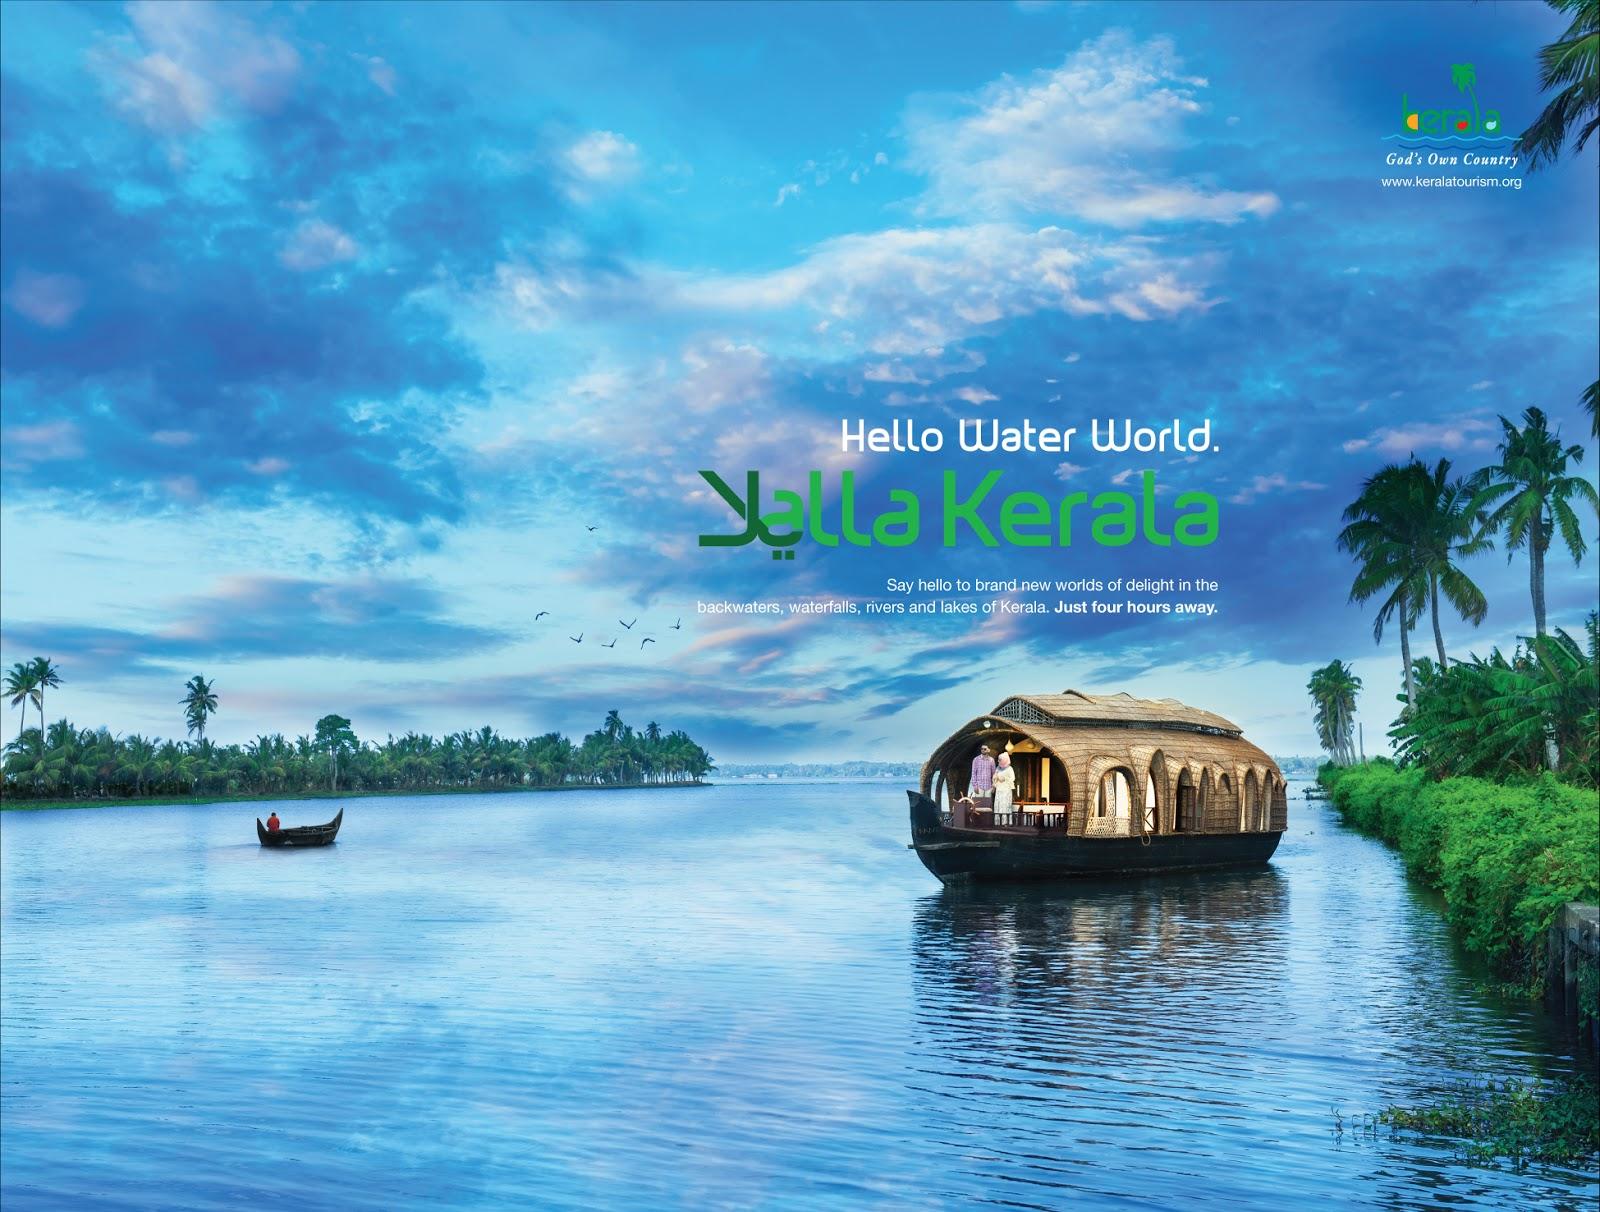 A Pinch of Arabic in Backwaters of Kerala - Yalla Kerala by Kerala Tourism   Stark Communications Pvt Ltd